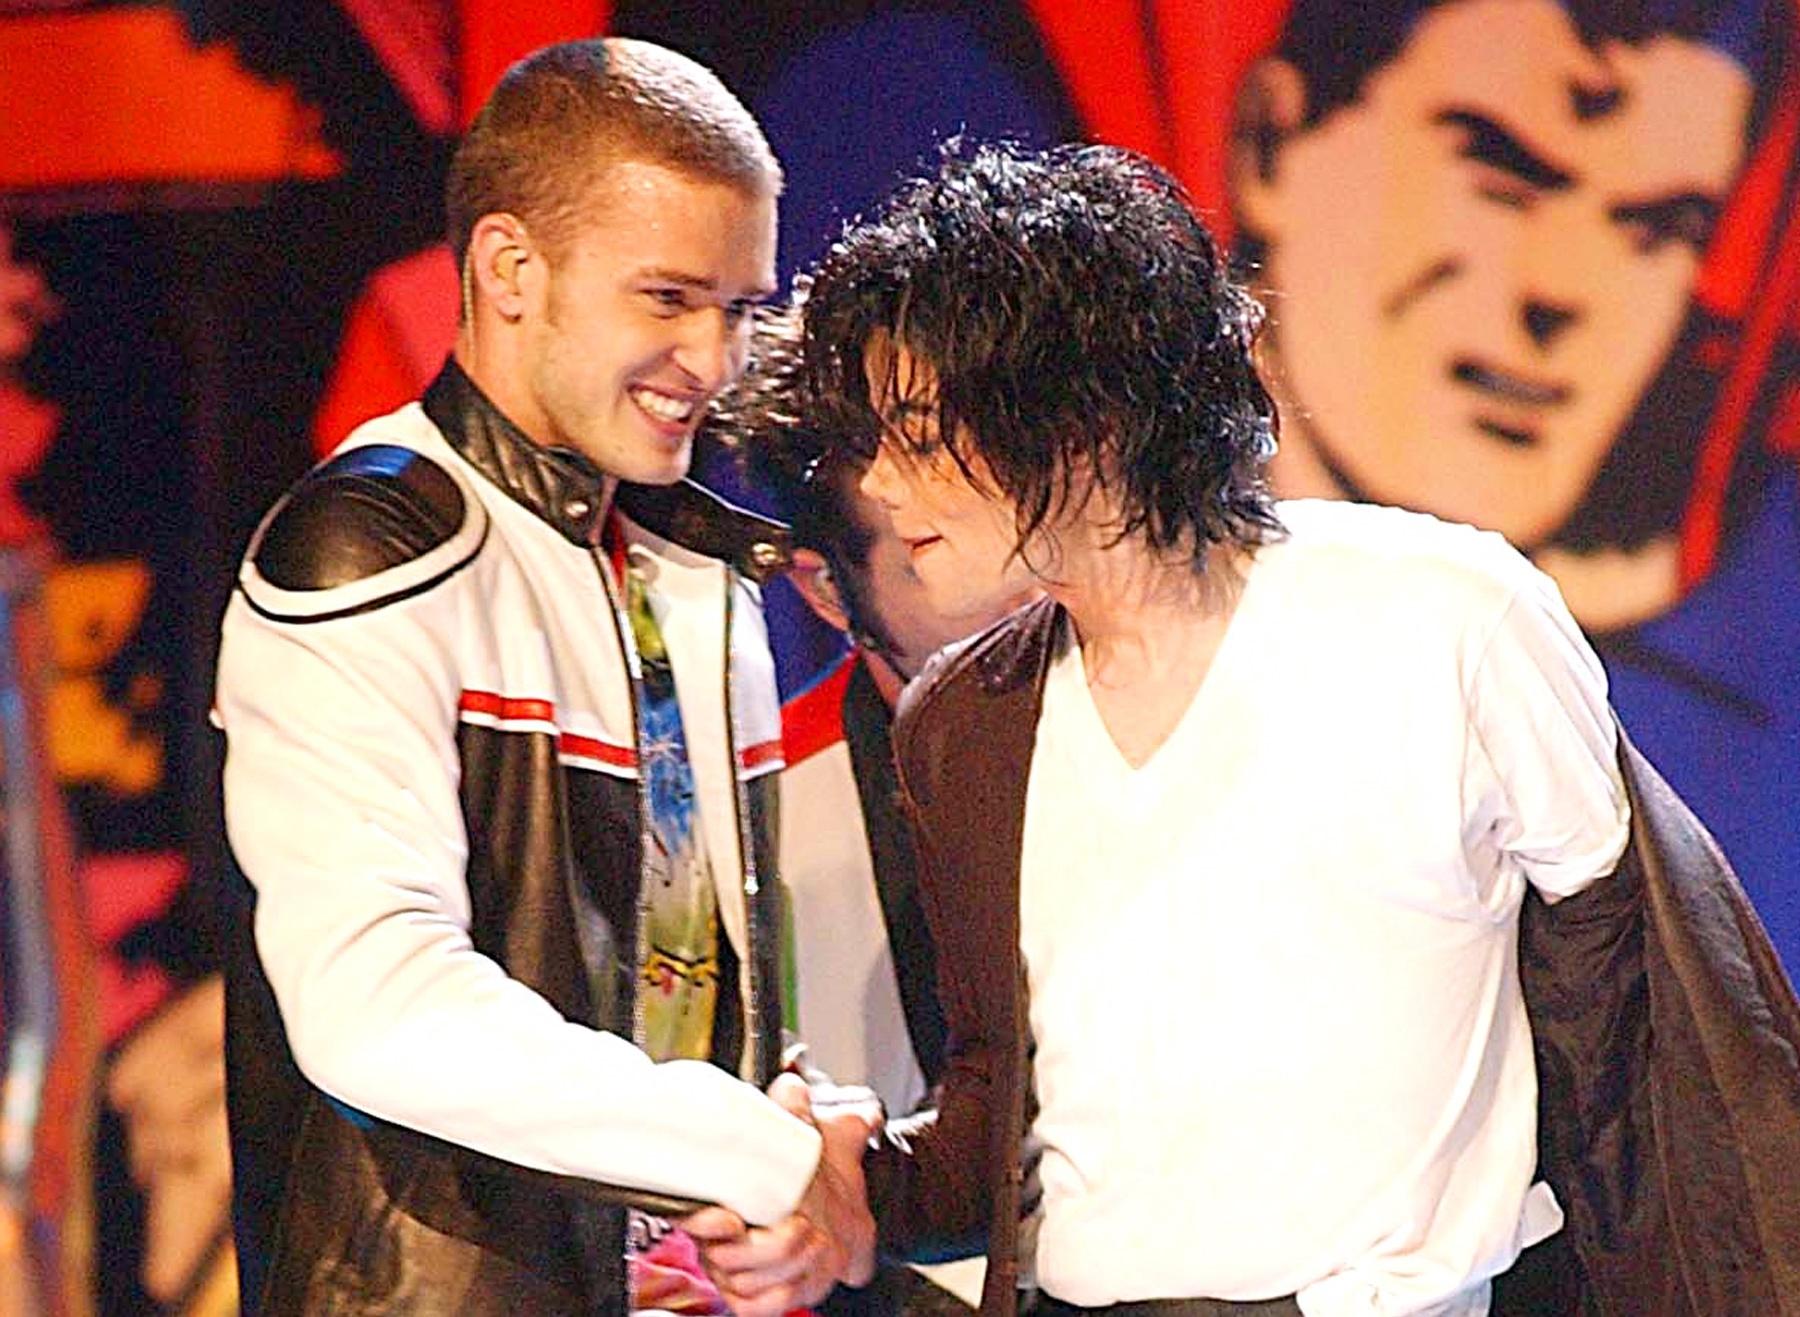 Accordi Love Never Felt So Good Michael Jackson, Justin Timberlake